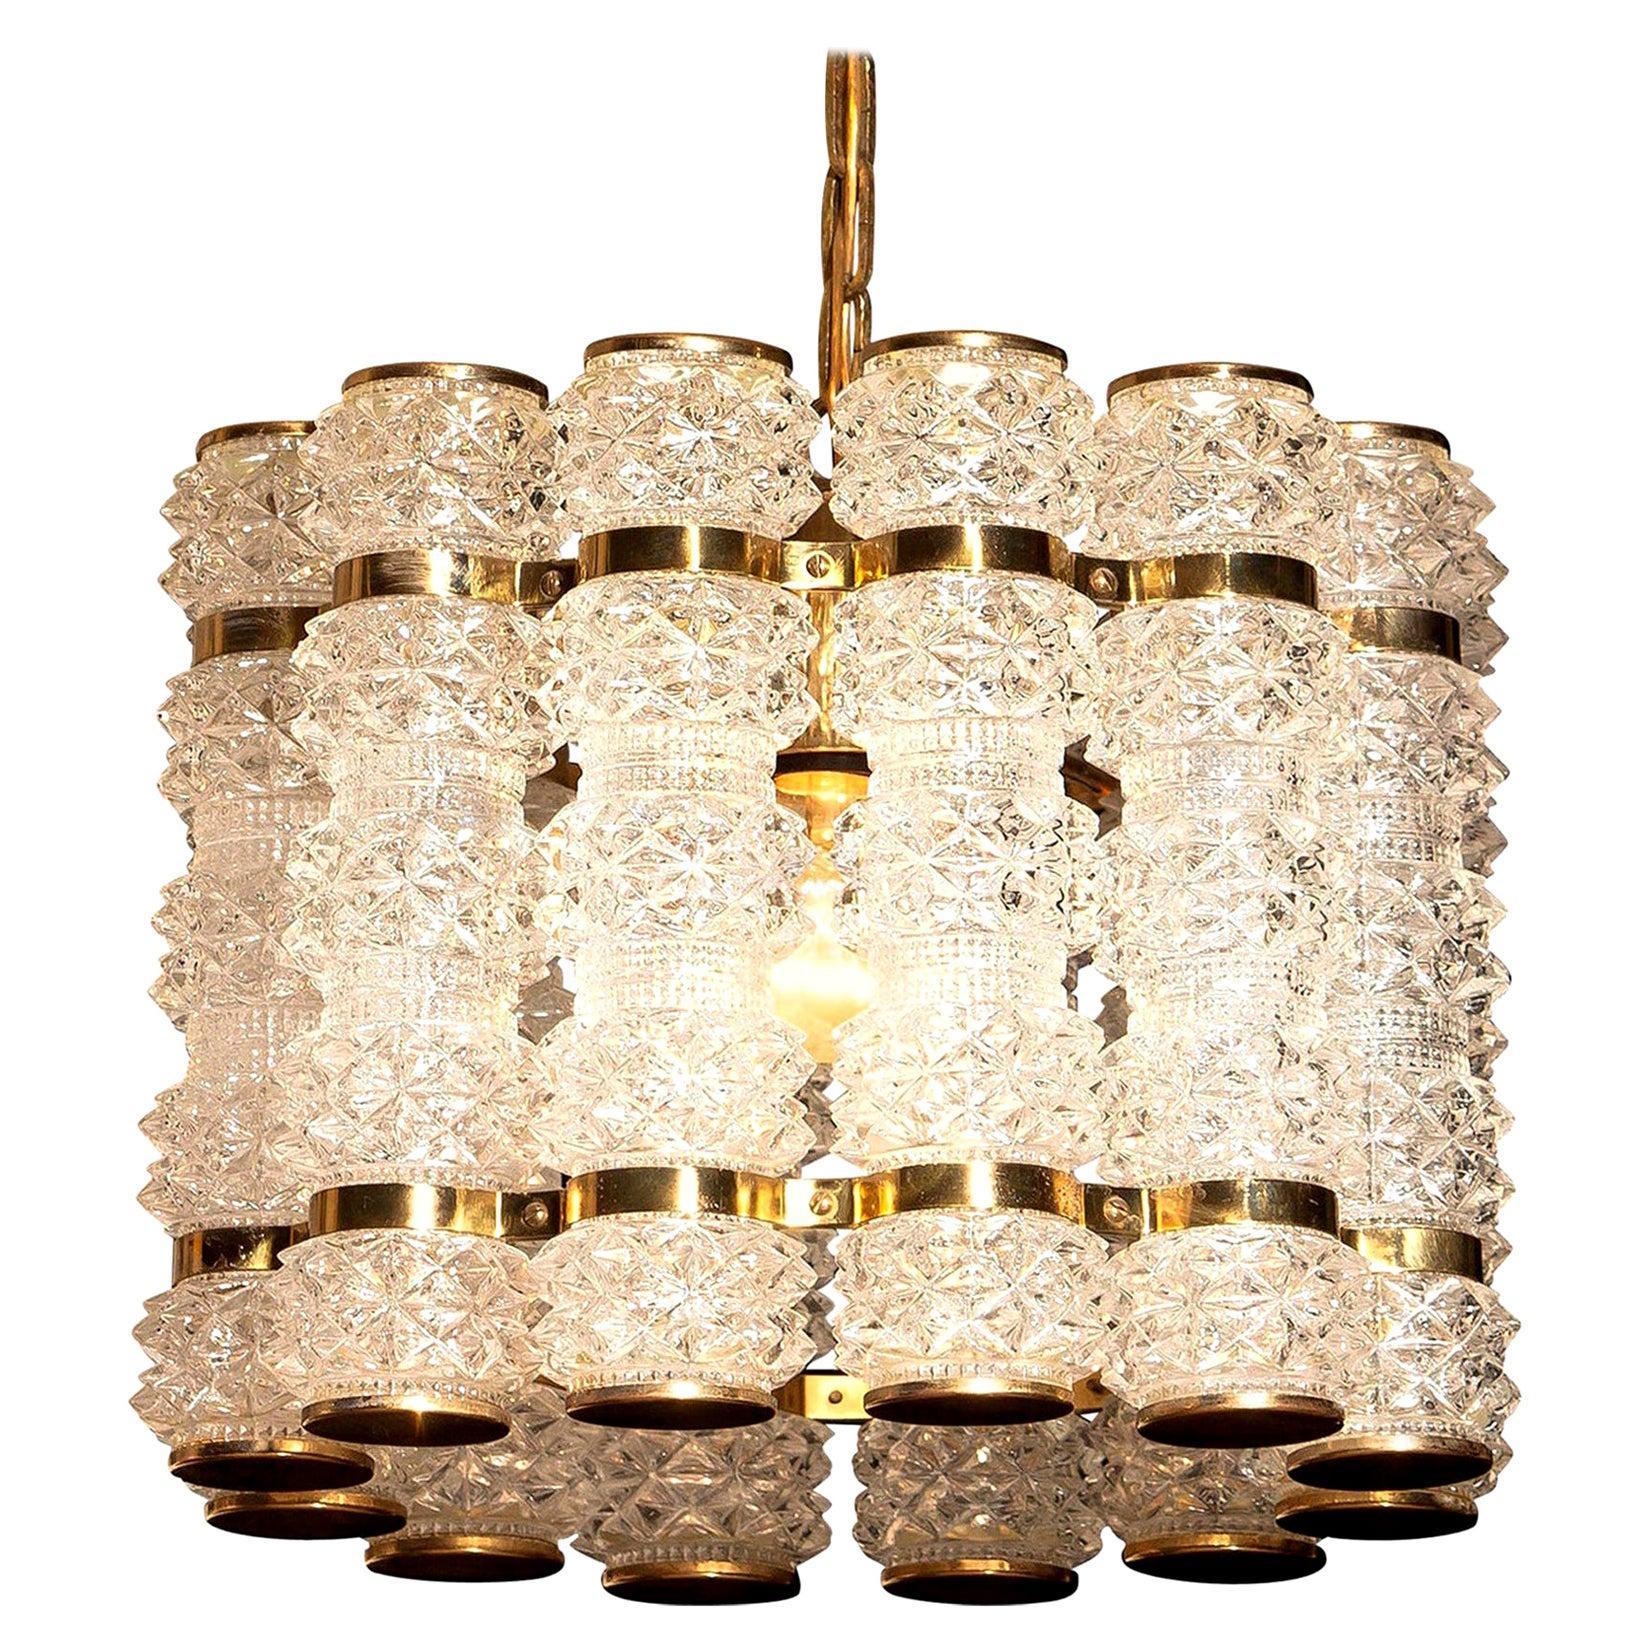 1960s, Crystal and Brass Cylinder Chandelier by Orrefors for Tyringe, Sweden